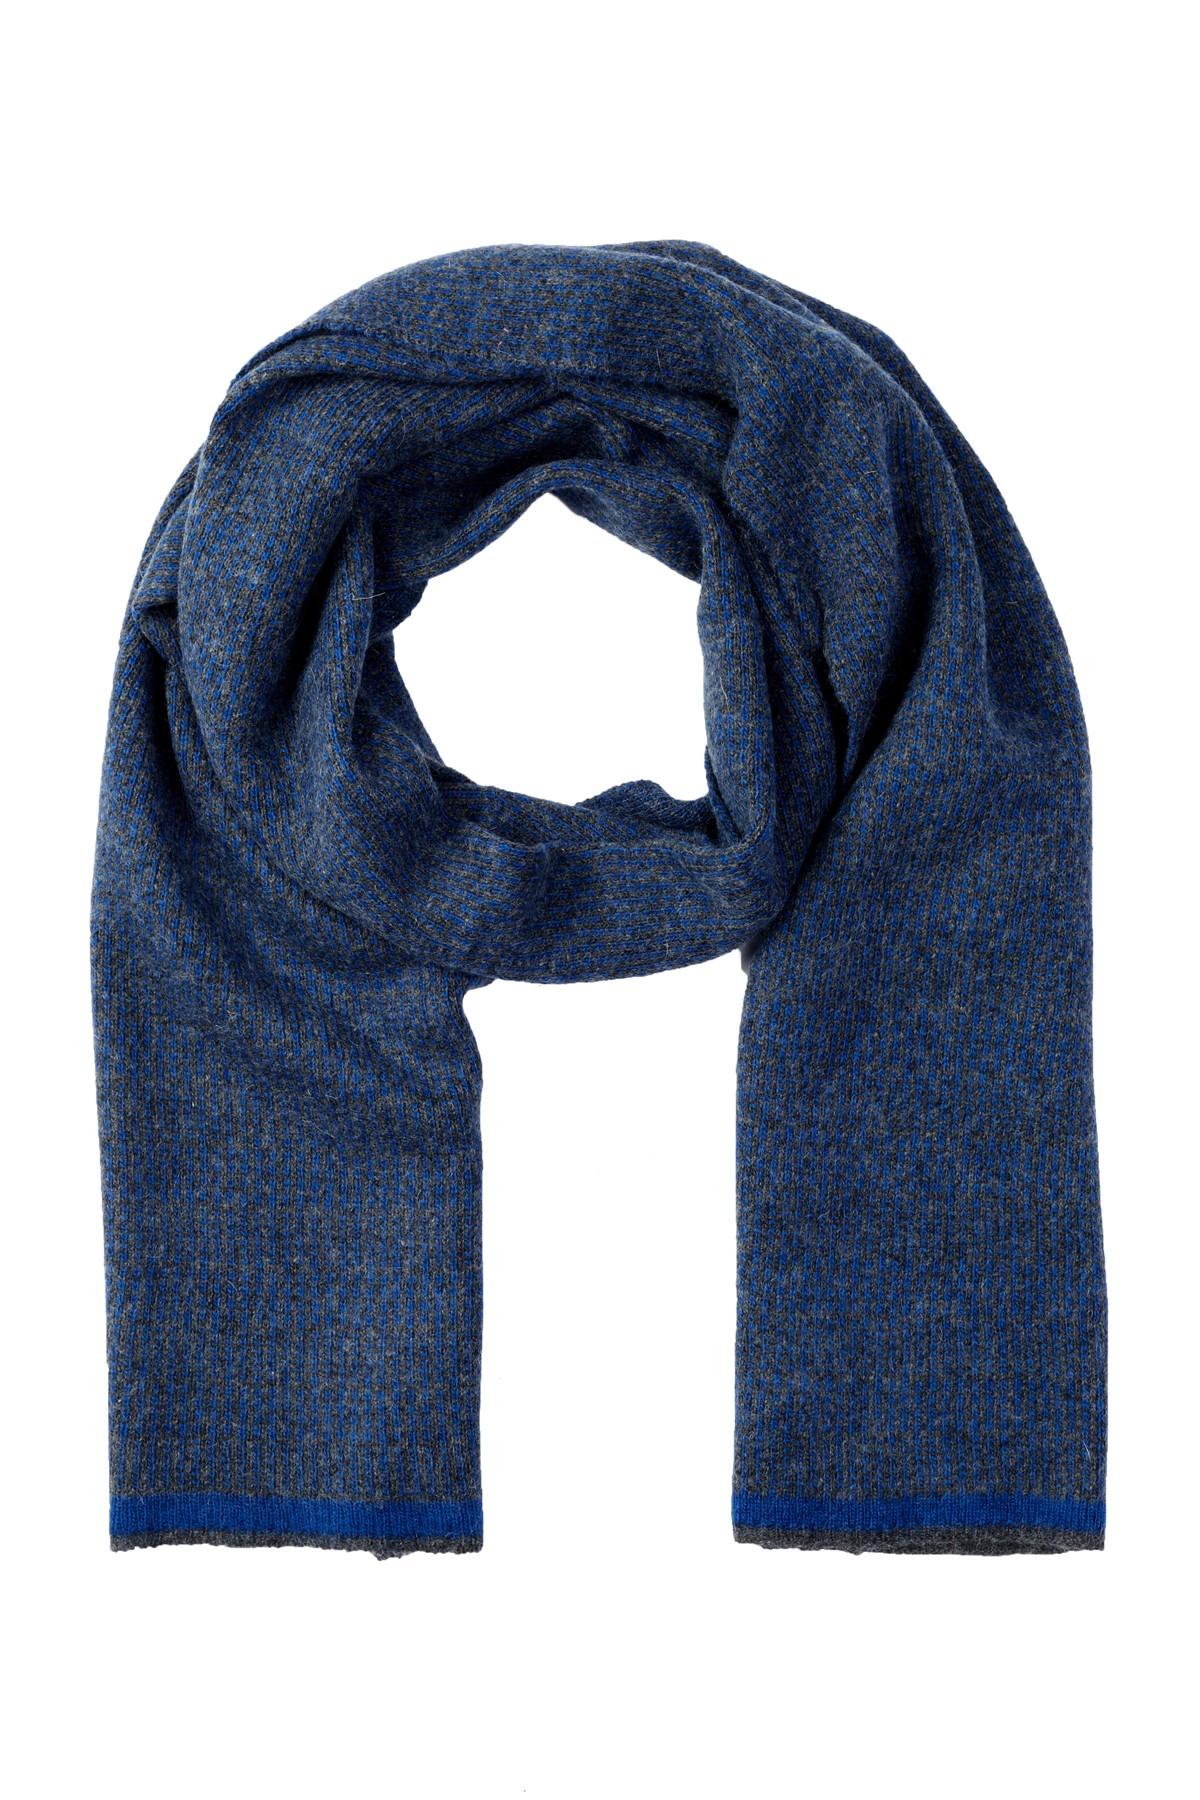 Portolano Melange Knit Scarf In Blue